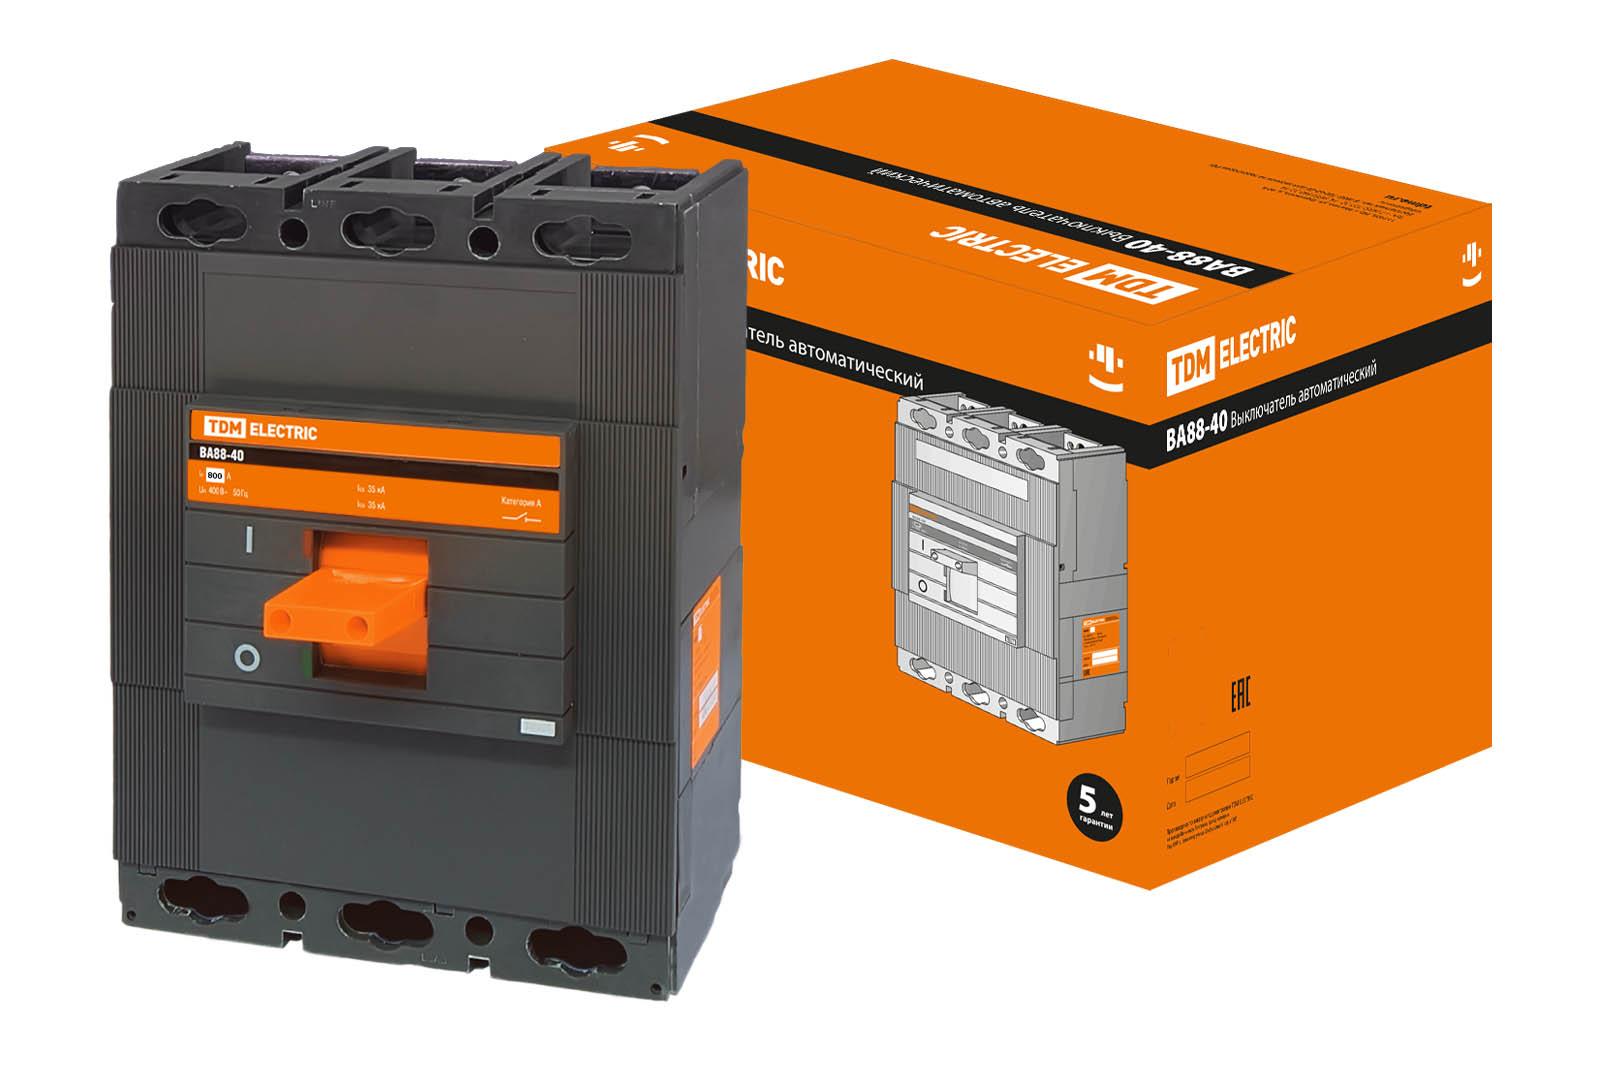 Автомат Tdm Sq0707-0024 автомат tdm sq0707 0008